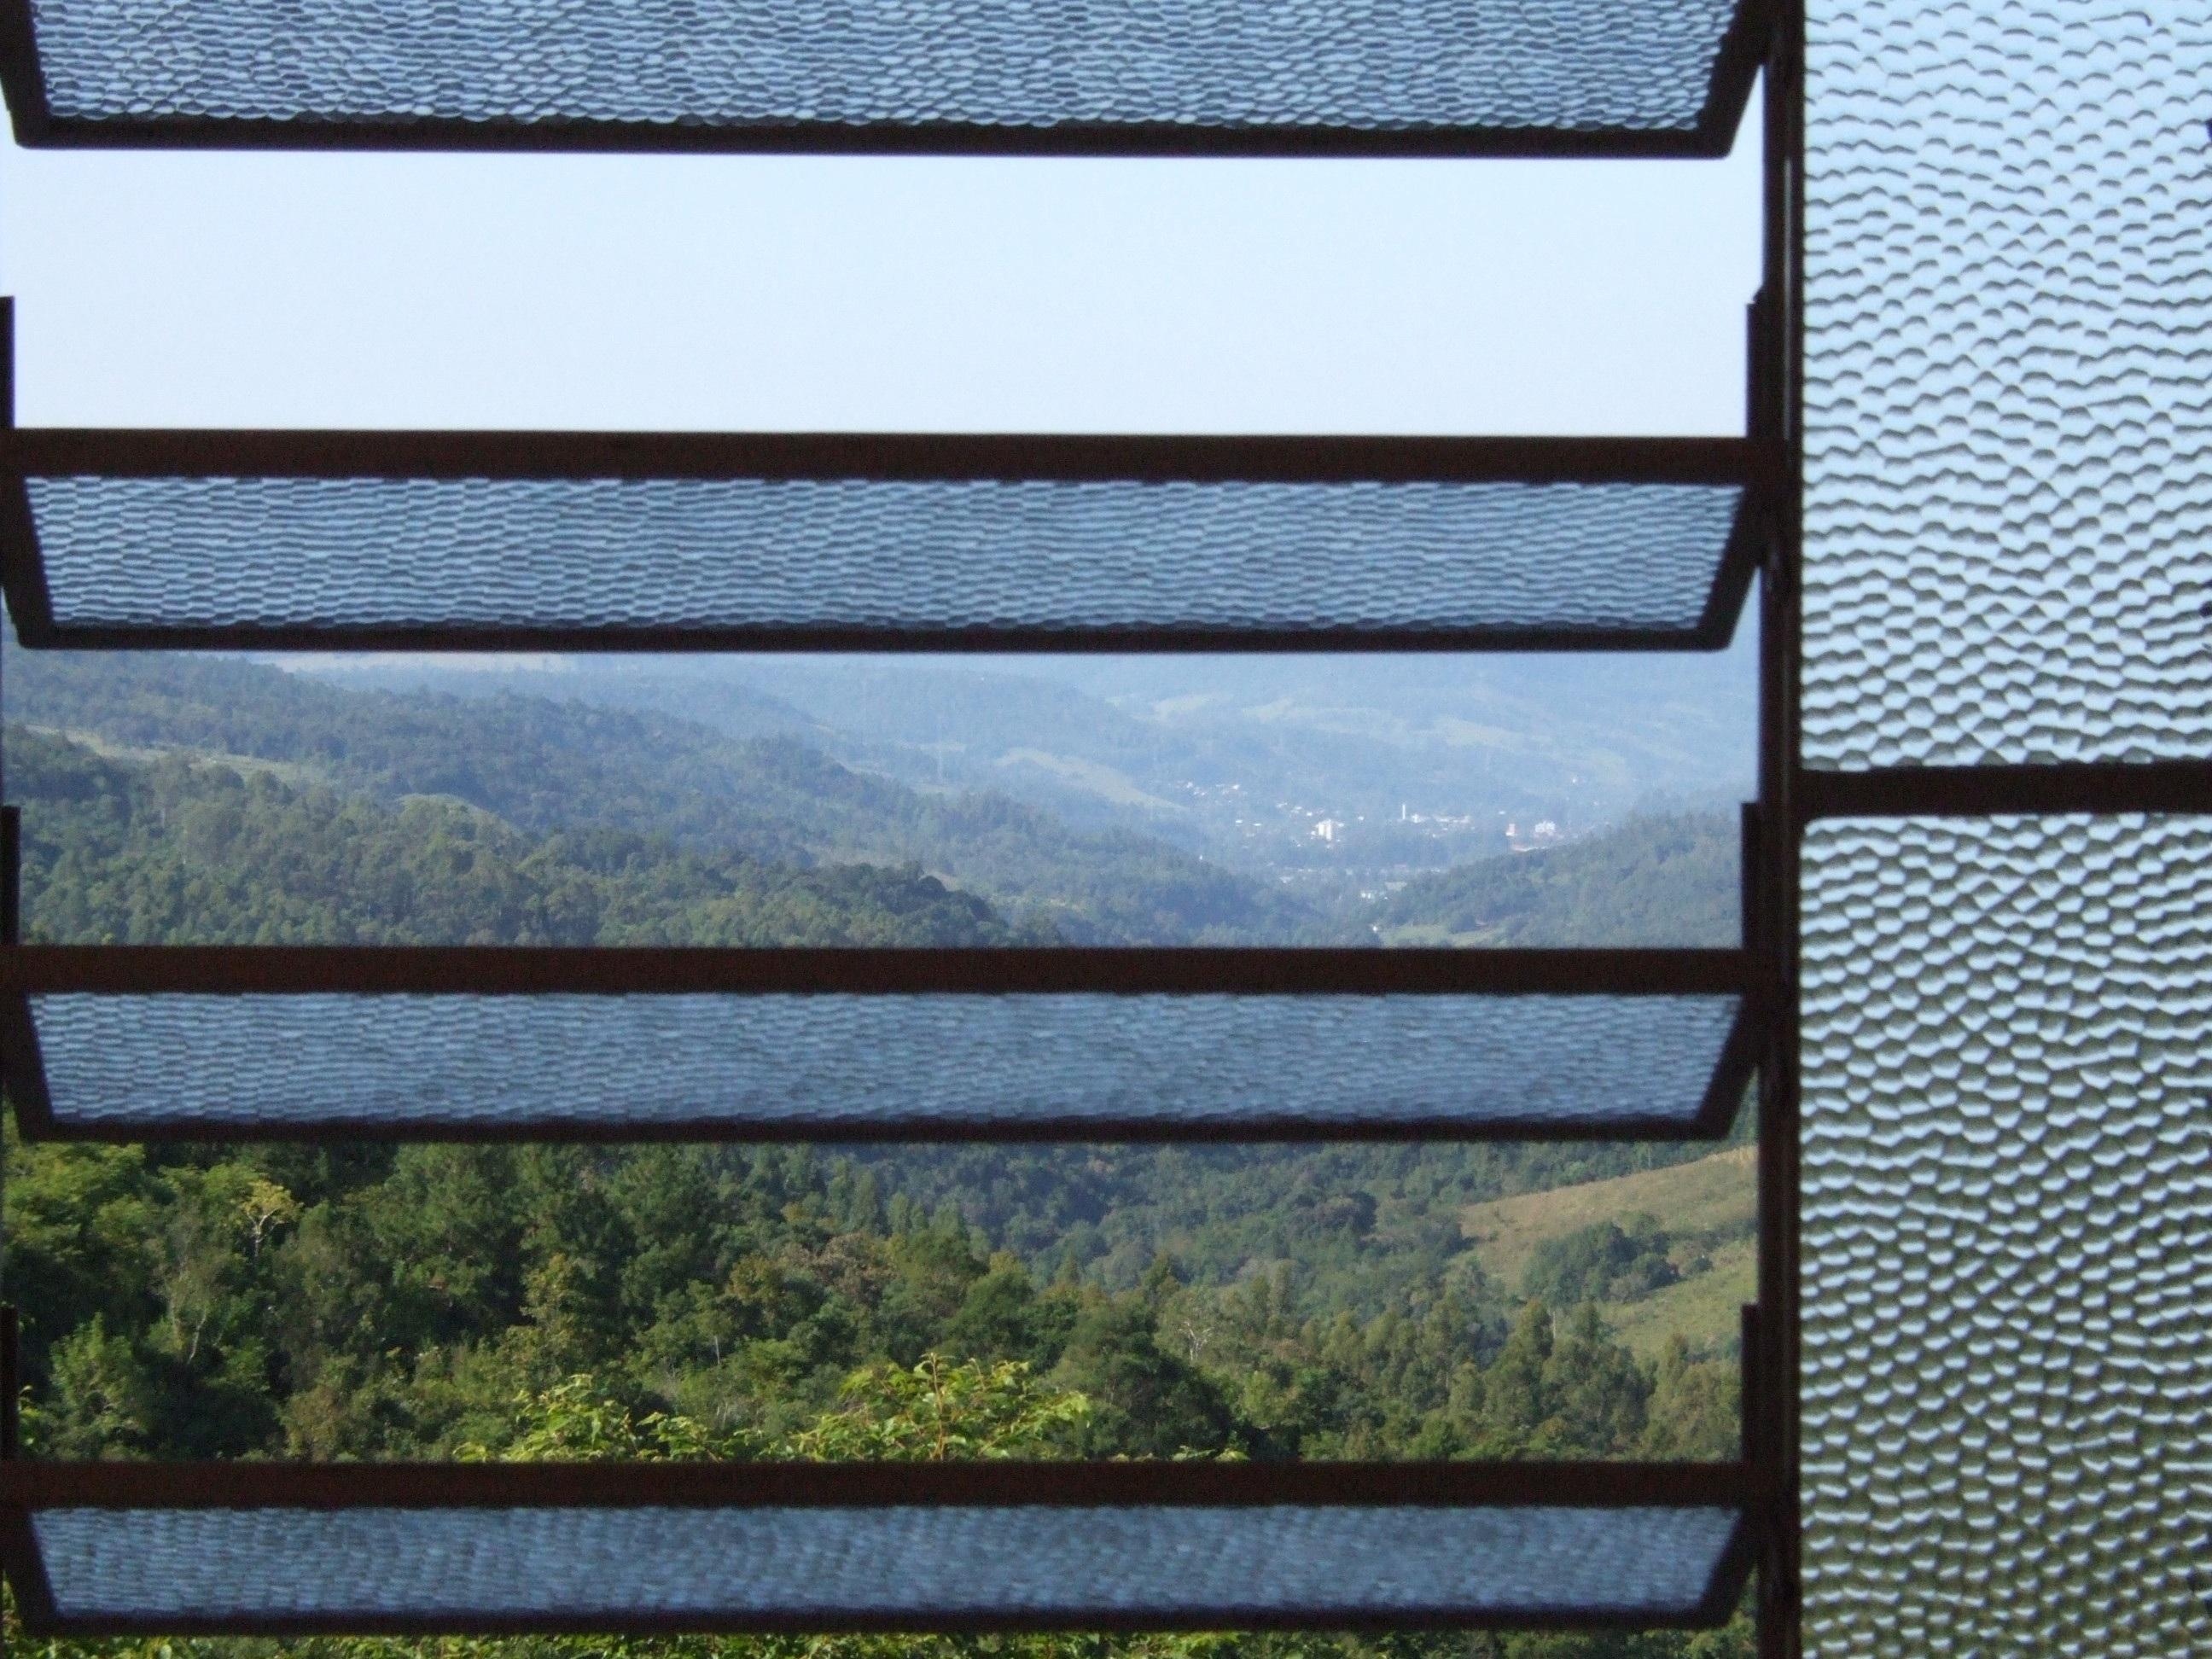 Fotos gratis : madera, pared, Valle, mueble, material, diseño de ...